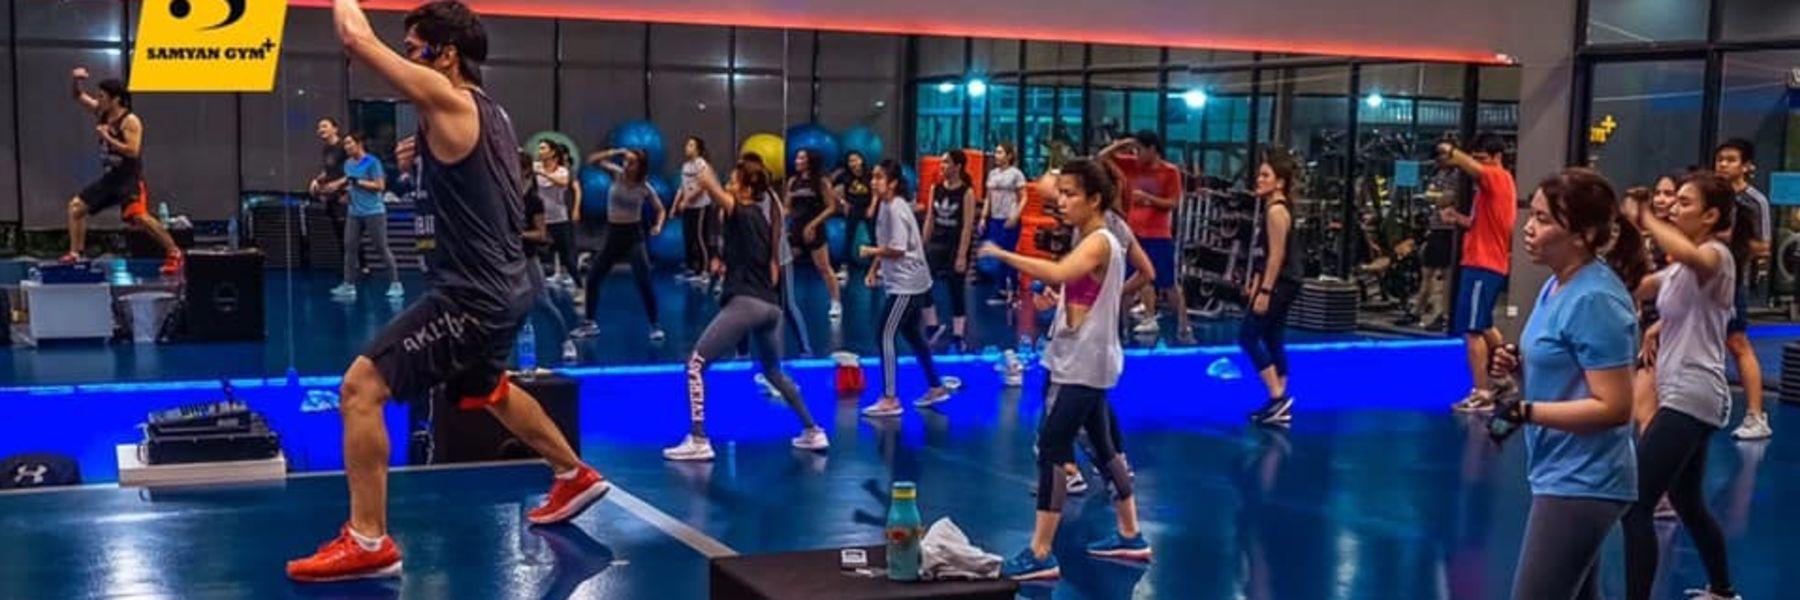 Samyan Gym Plus - La Salle image